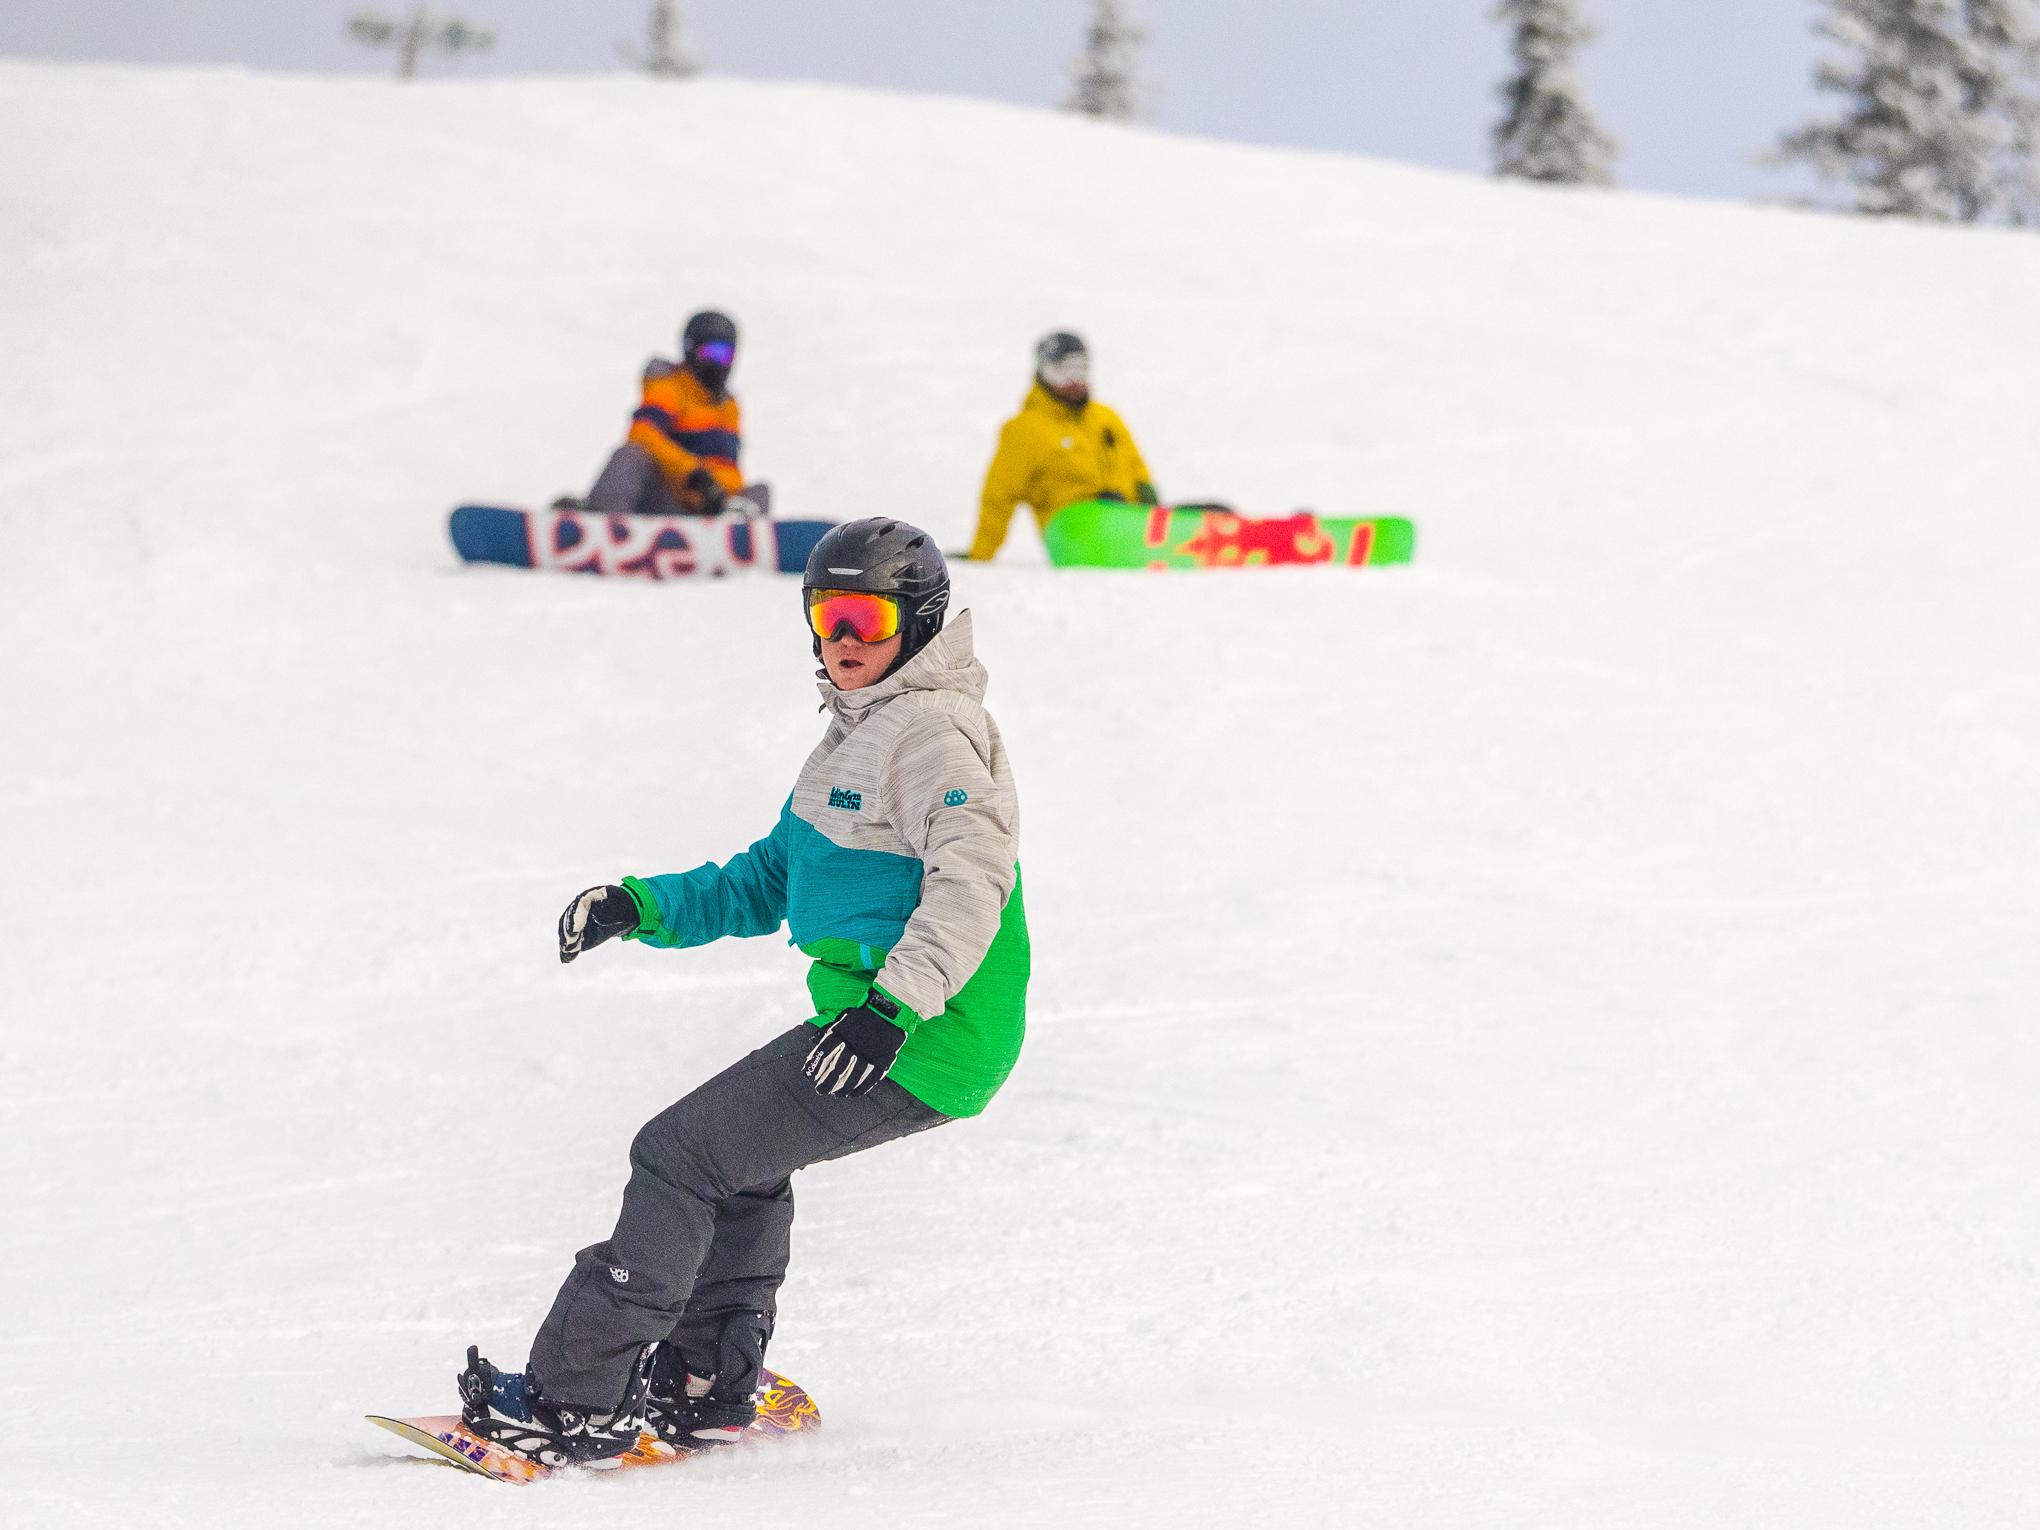 Snowboardinbg-RIDGE-Mountain-Academy-1.jpg